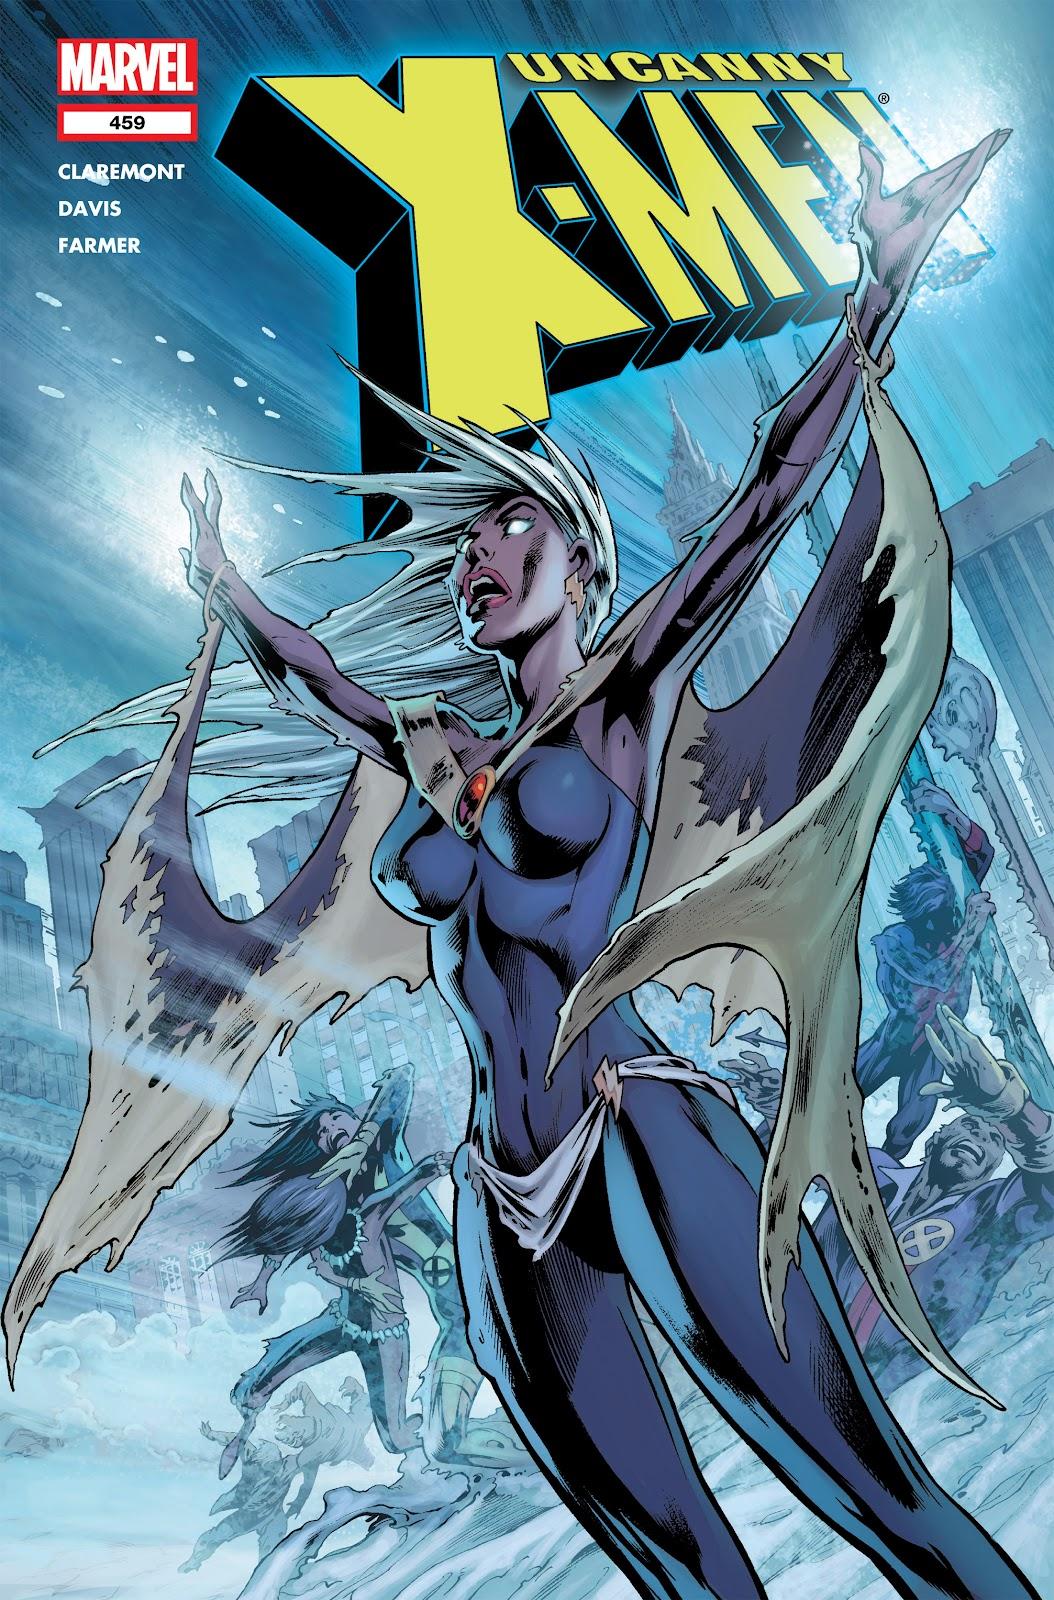 Uncanny X-Men (1963) issue 459 - Page 1